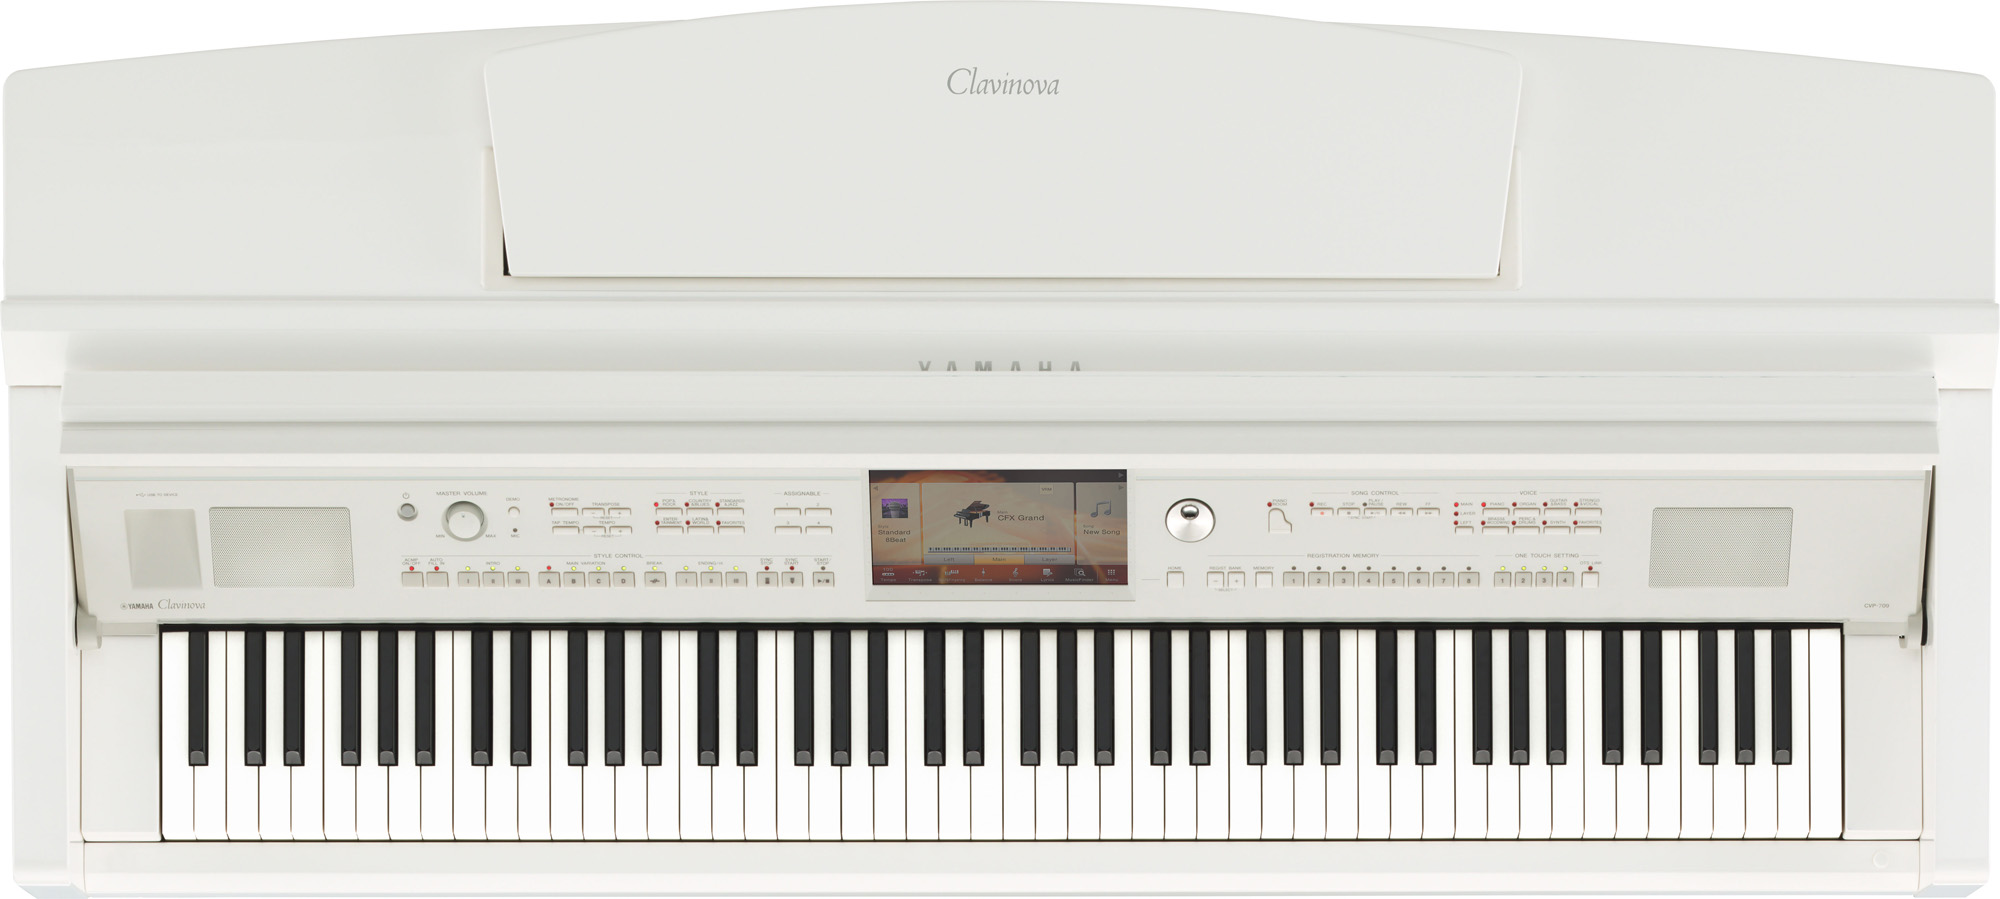 Yamaha cvp 709 clavinova digital piano in polished white for Yamaha cvp 709